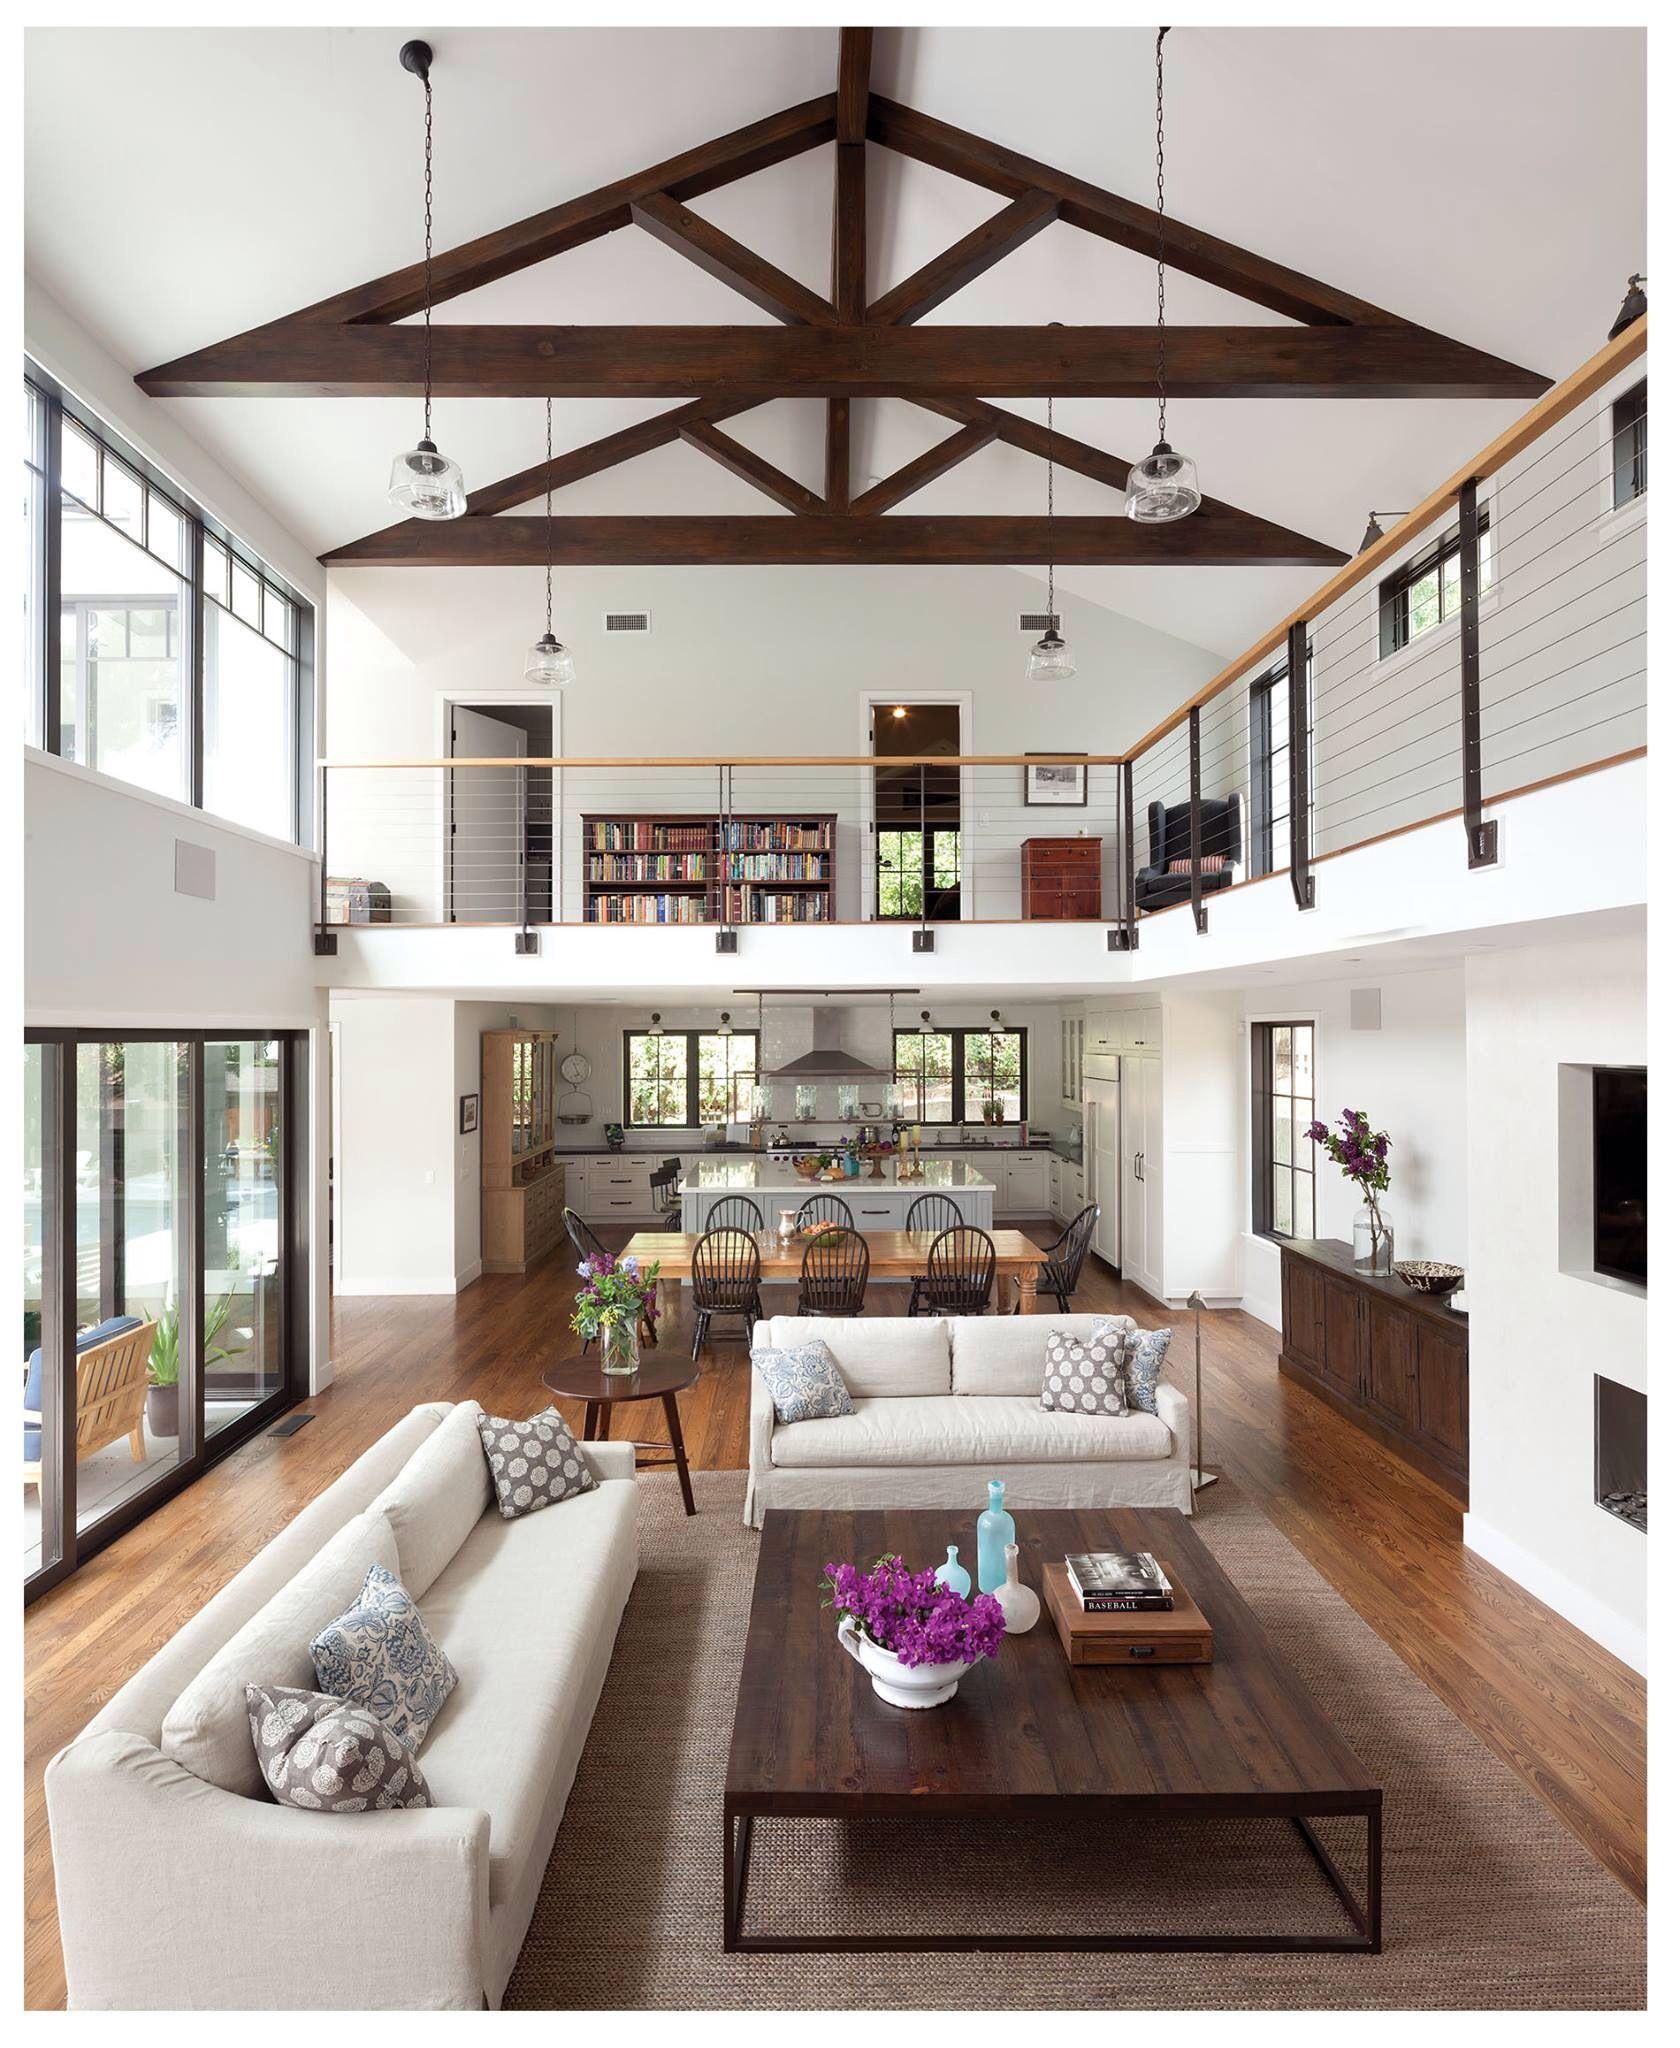 10+ Great Ideas for Modern Barndominium Plans | House plan ...